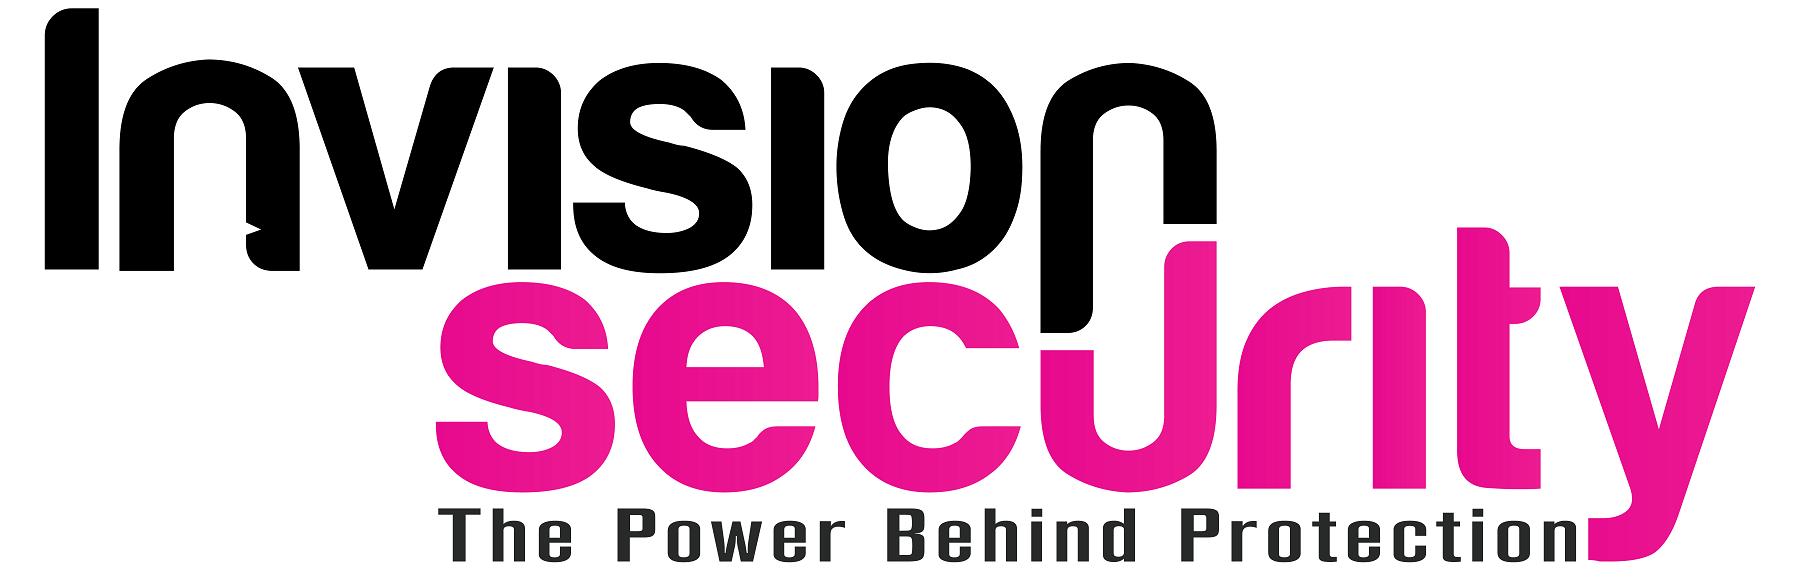 Invision Security Logo